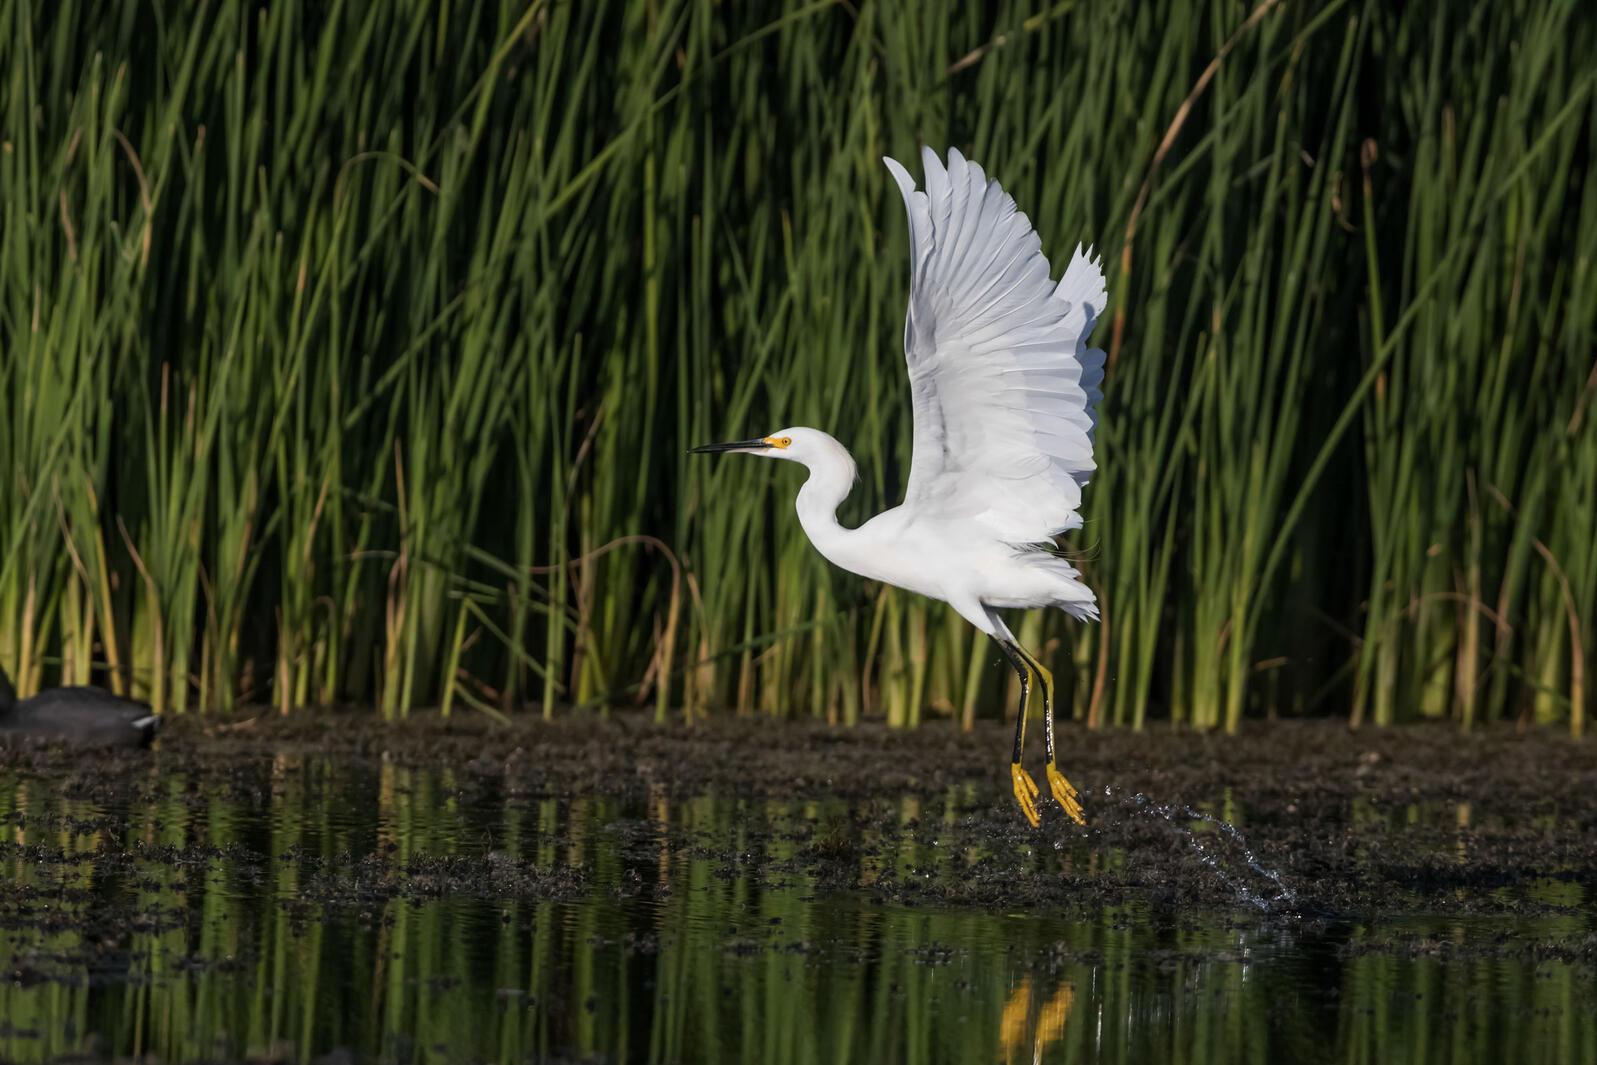 Snowy Egret. Claudio-Contreras Koob/Audubon